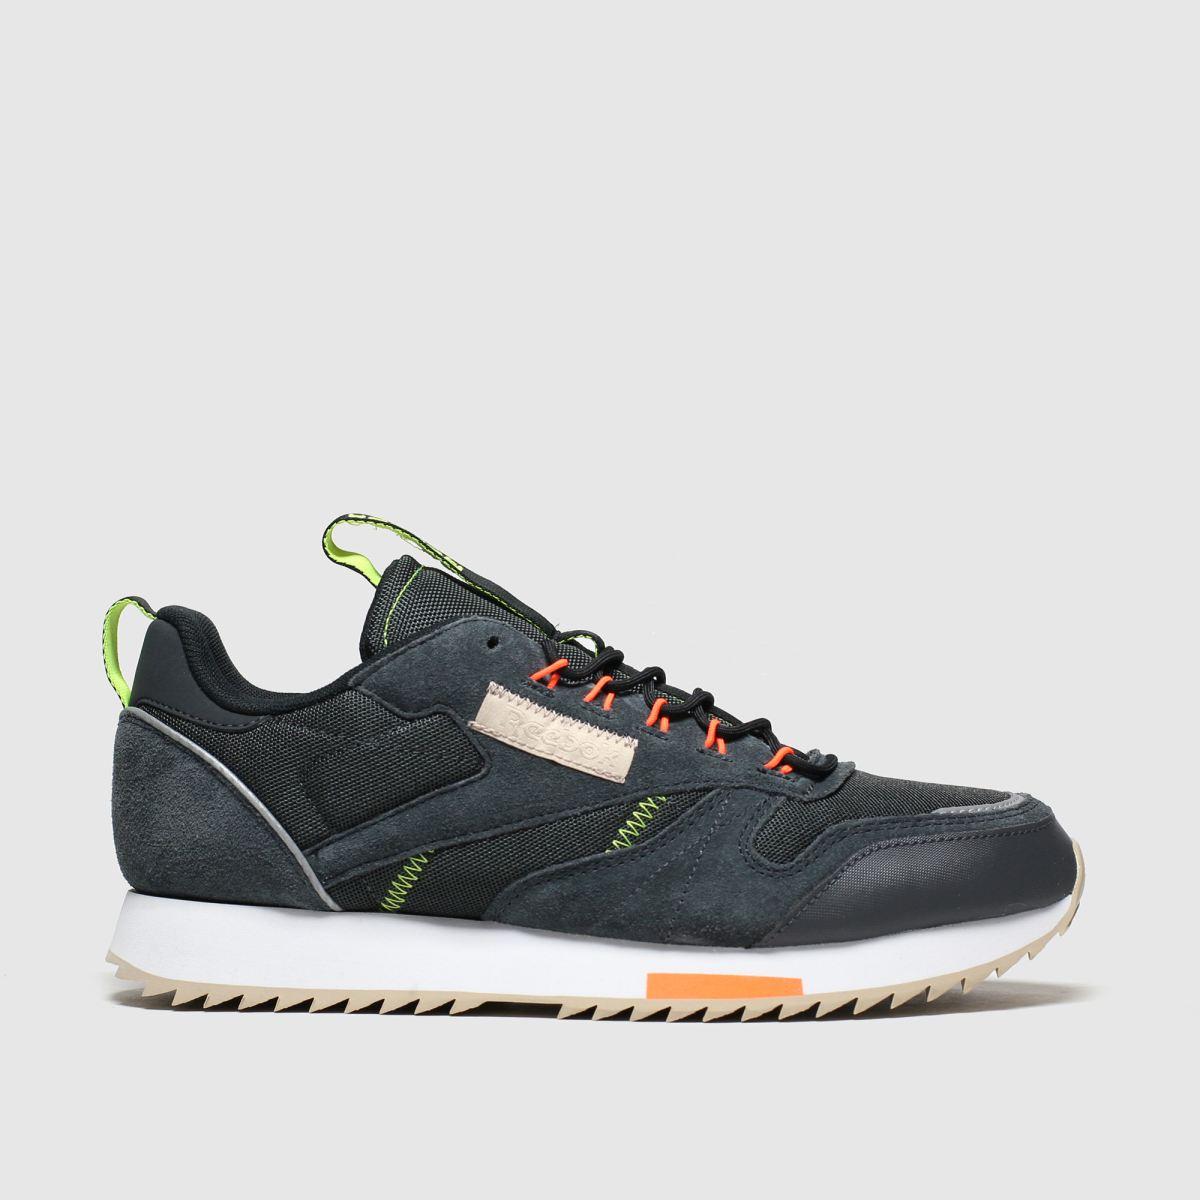 Reebok Dark Grey Classic Leather Ripple Trail Trainers